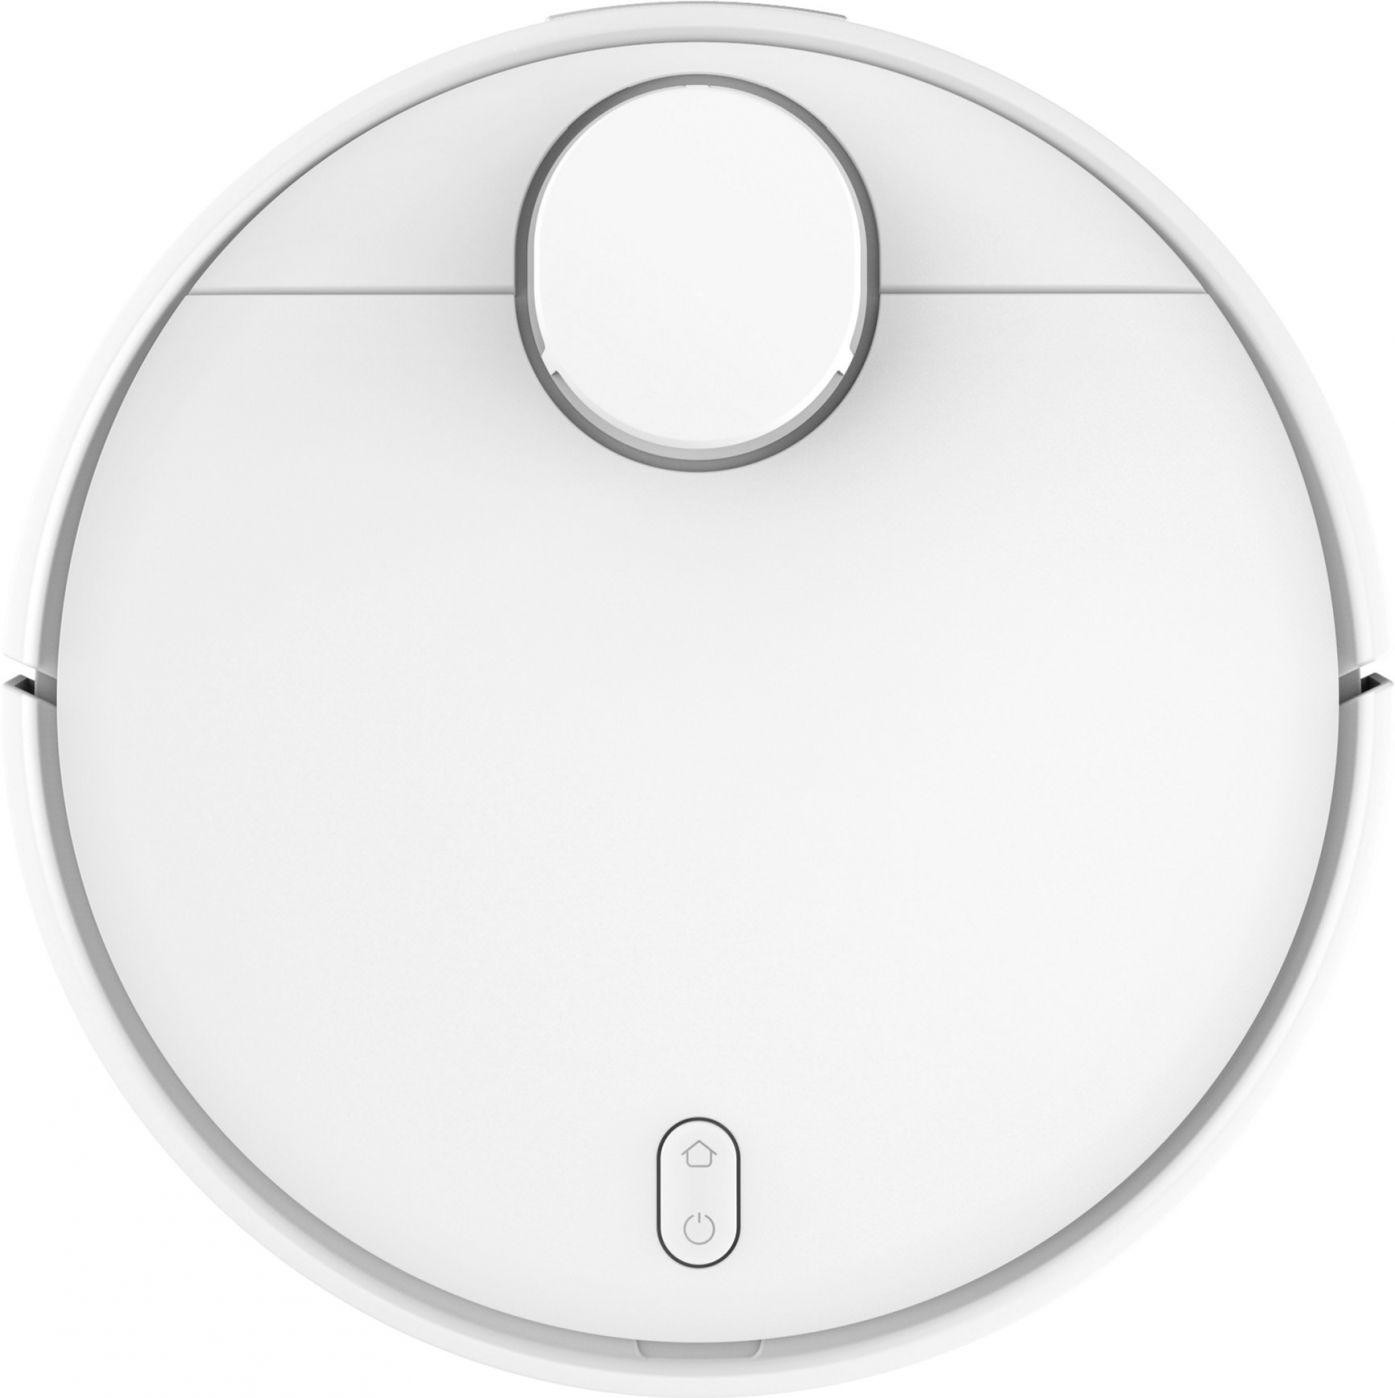 Xiaomi Mi Robot vacuum Mop Pro 2in1 White SKV4110GL robots putekļsūcējs